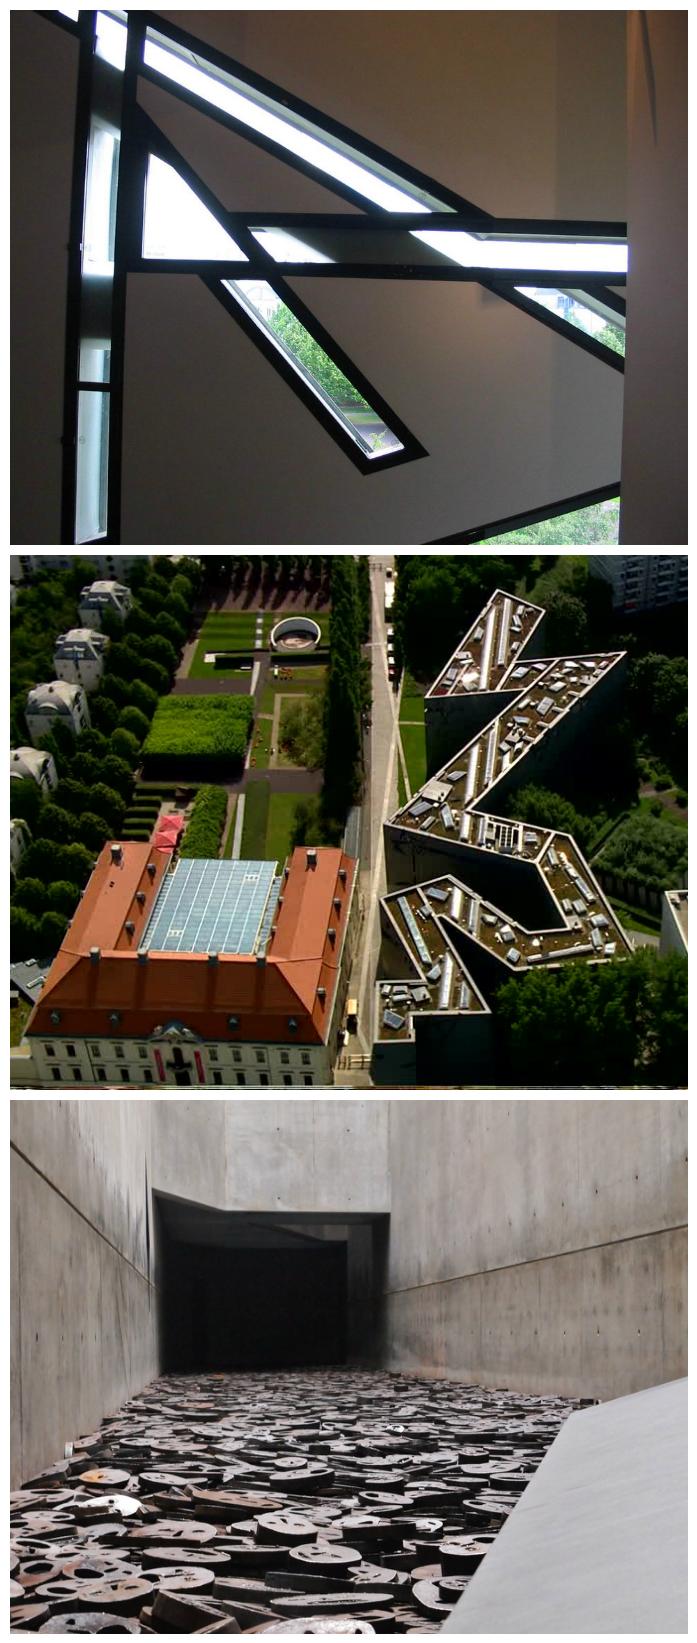 Daniel Libeskind musee juif de berlin architecture